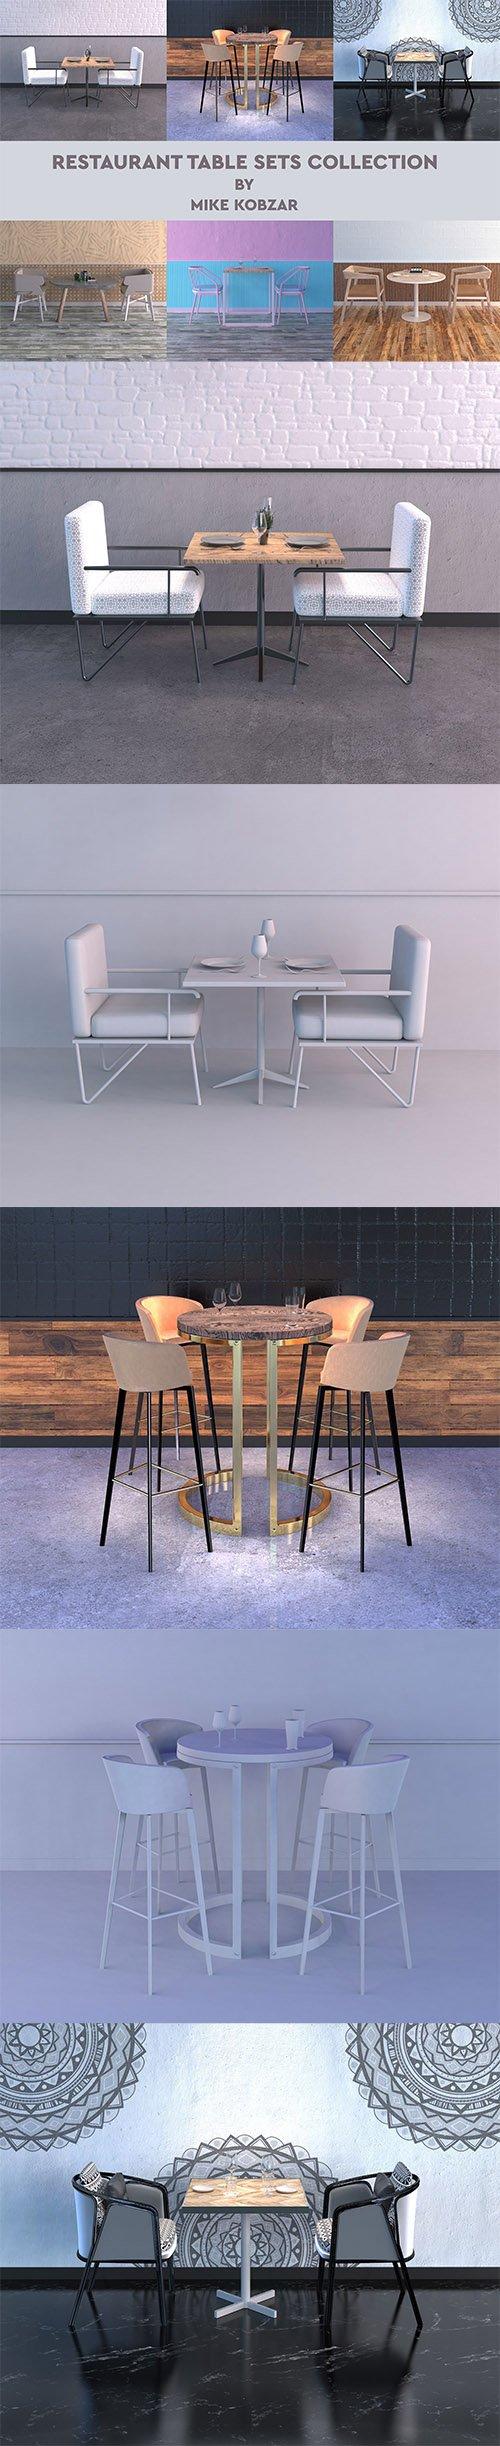 RESTAURANT TABLE SETS COLLECTION 3D model